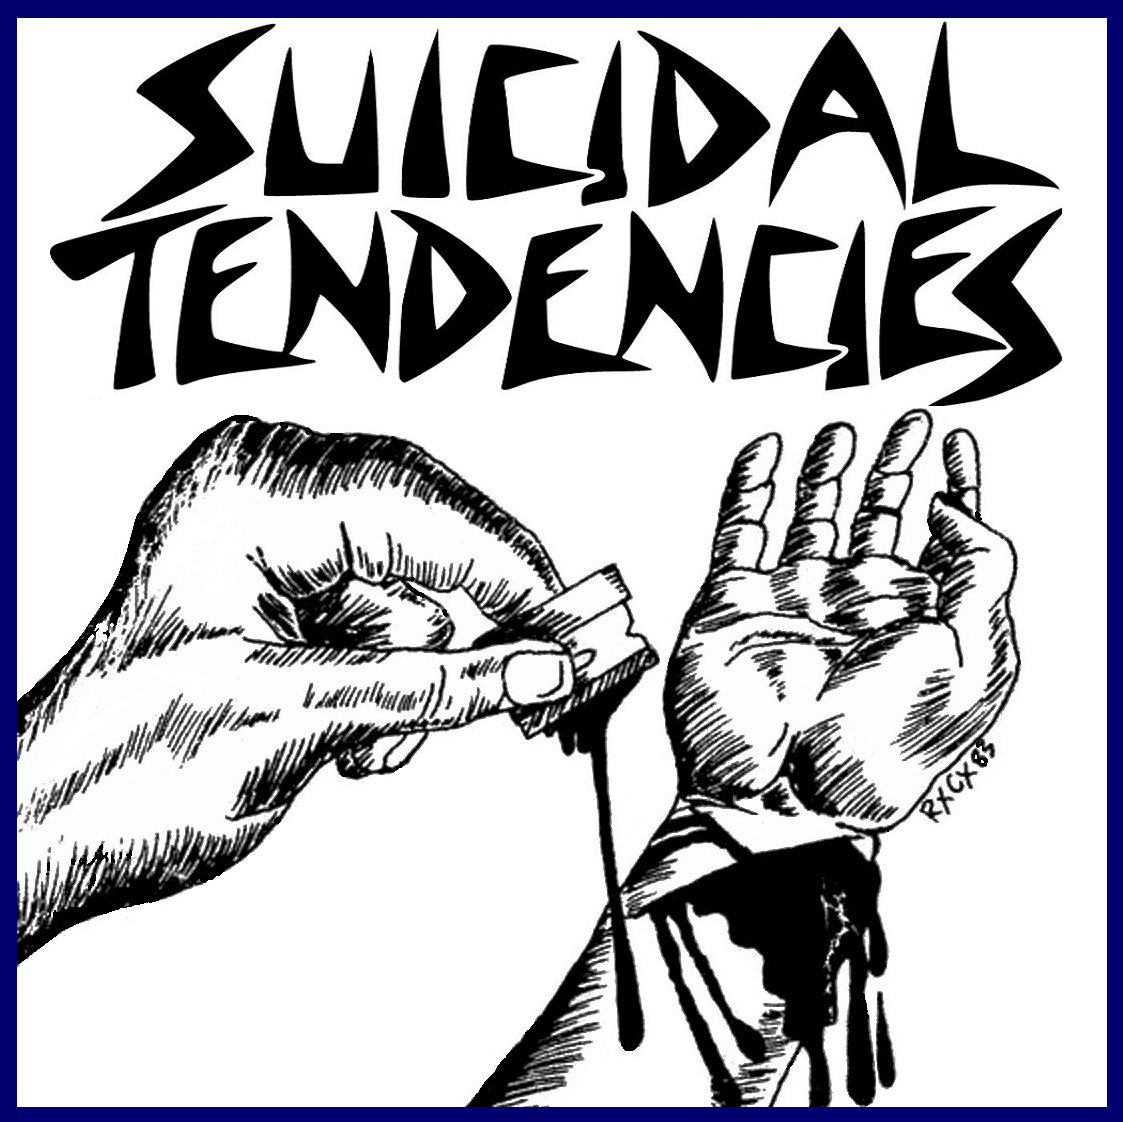 High Resolution Wallpaper   Suicidal Tendencies 1123x1122 px